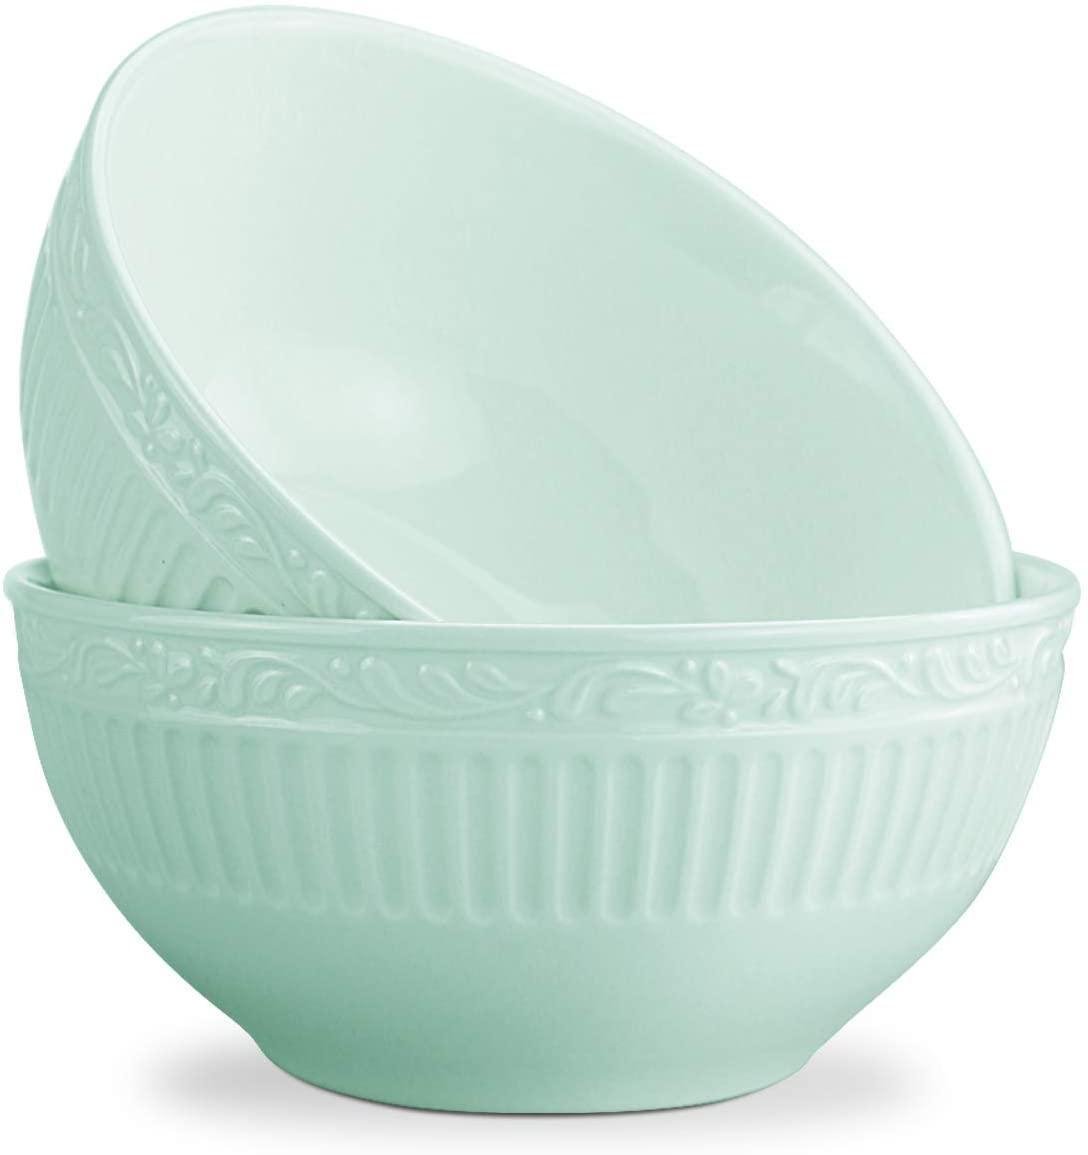 STAR MOON Ceramic Dinnerware Kitchen Bowls Large Serving Set for Cereal Soup, Green Set of 2, 550 ml, Microwave&Dishwasher Safe, BPA Free, Green (Set of 2)